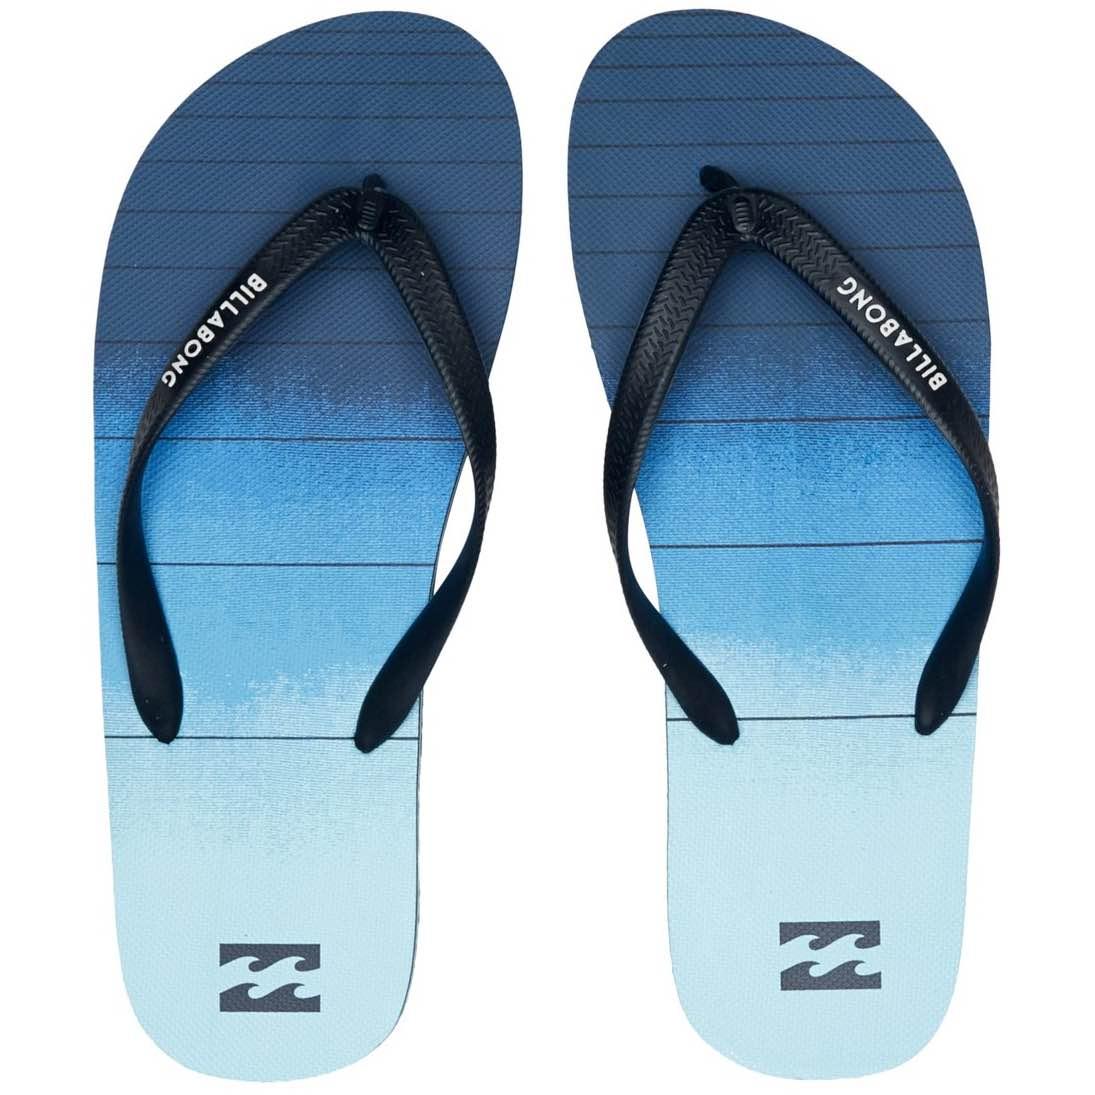 Billabong Tides 73 Stripe Flip Flops navy blue fade summer slaps slides beach shoes holiday